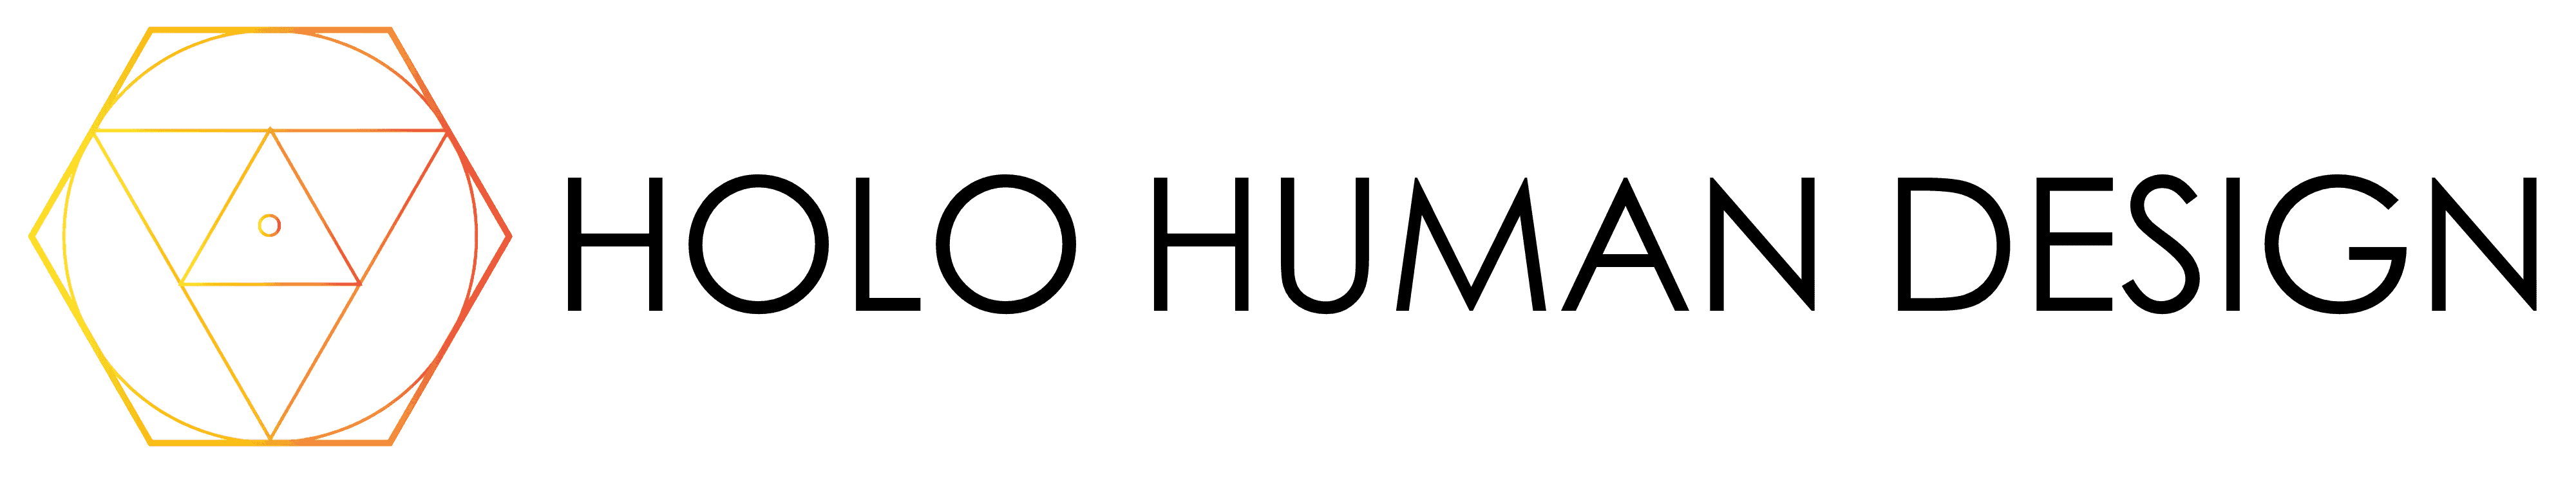 Holo Human Design